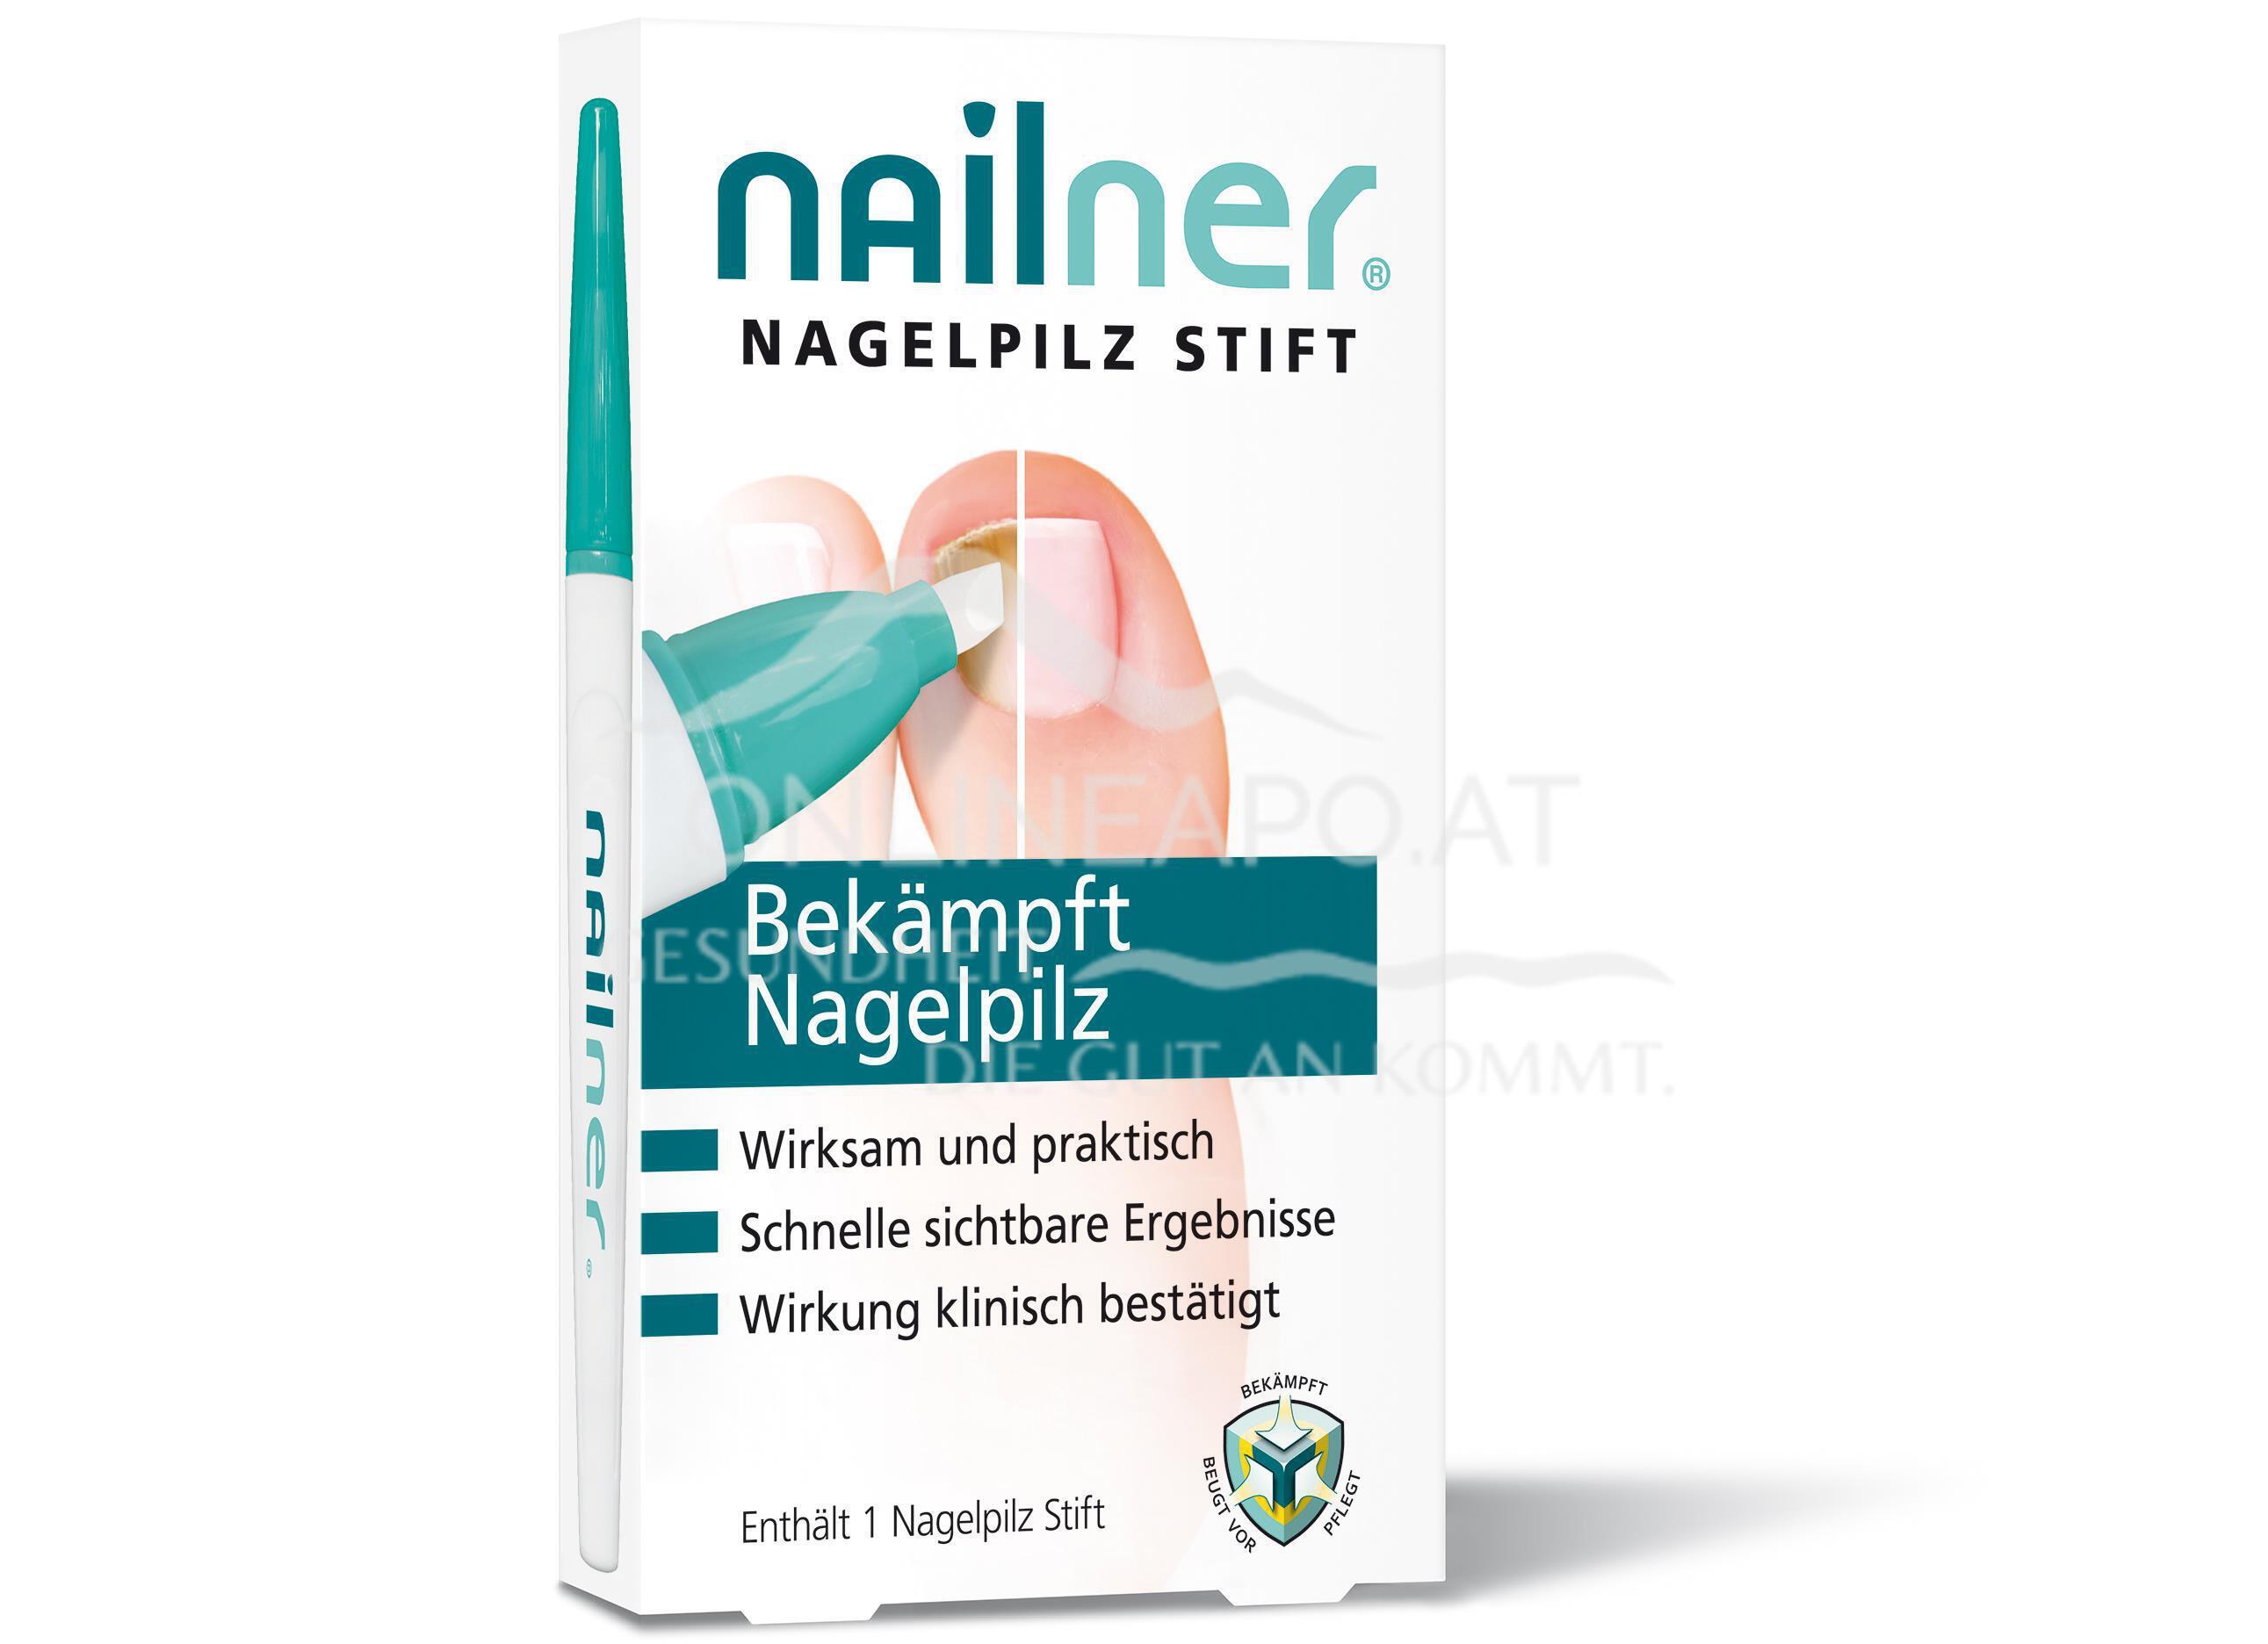 Nailner Nagelpilz Stift